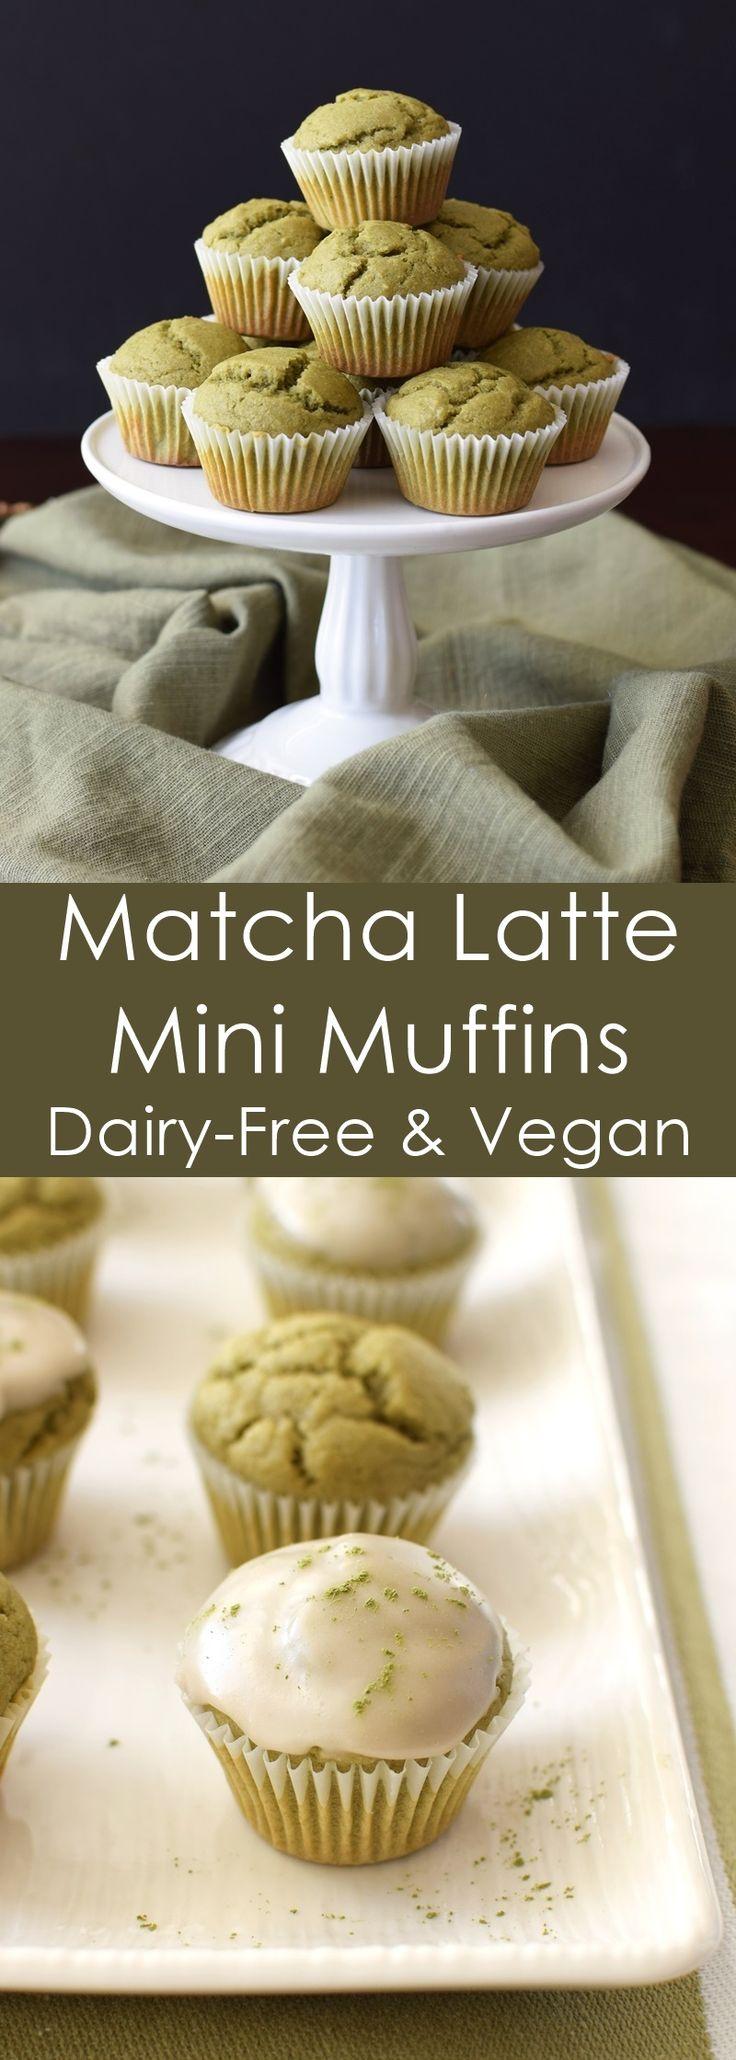 Matcha Latte Mini Muffins Recipe (easy, dairy-free & vegan)